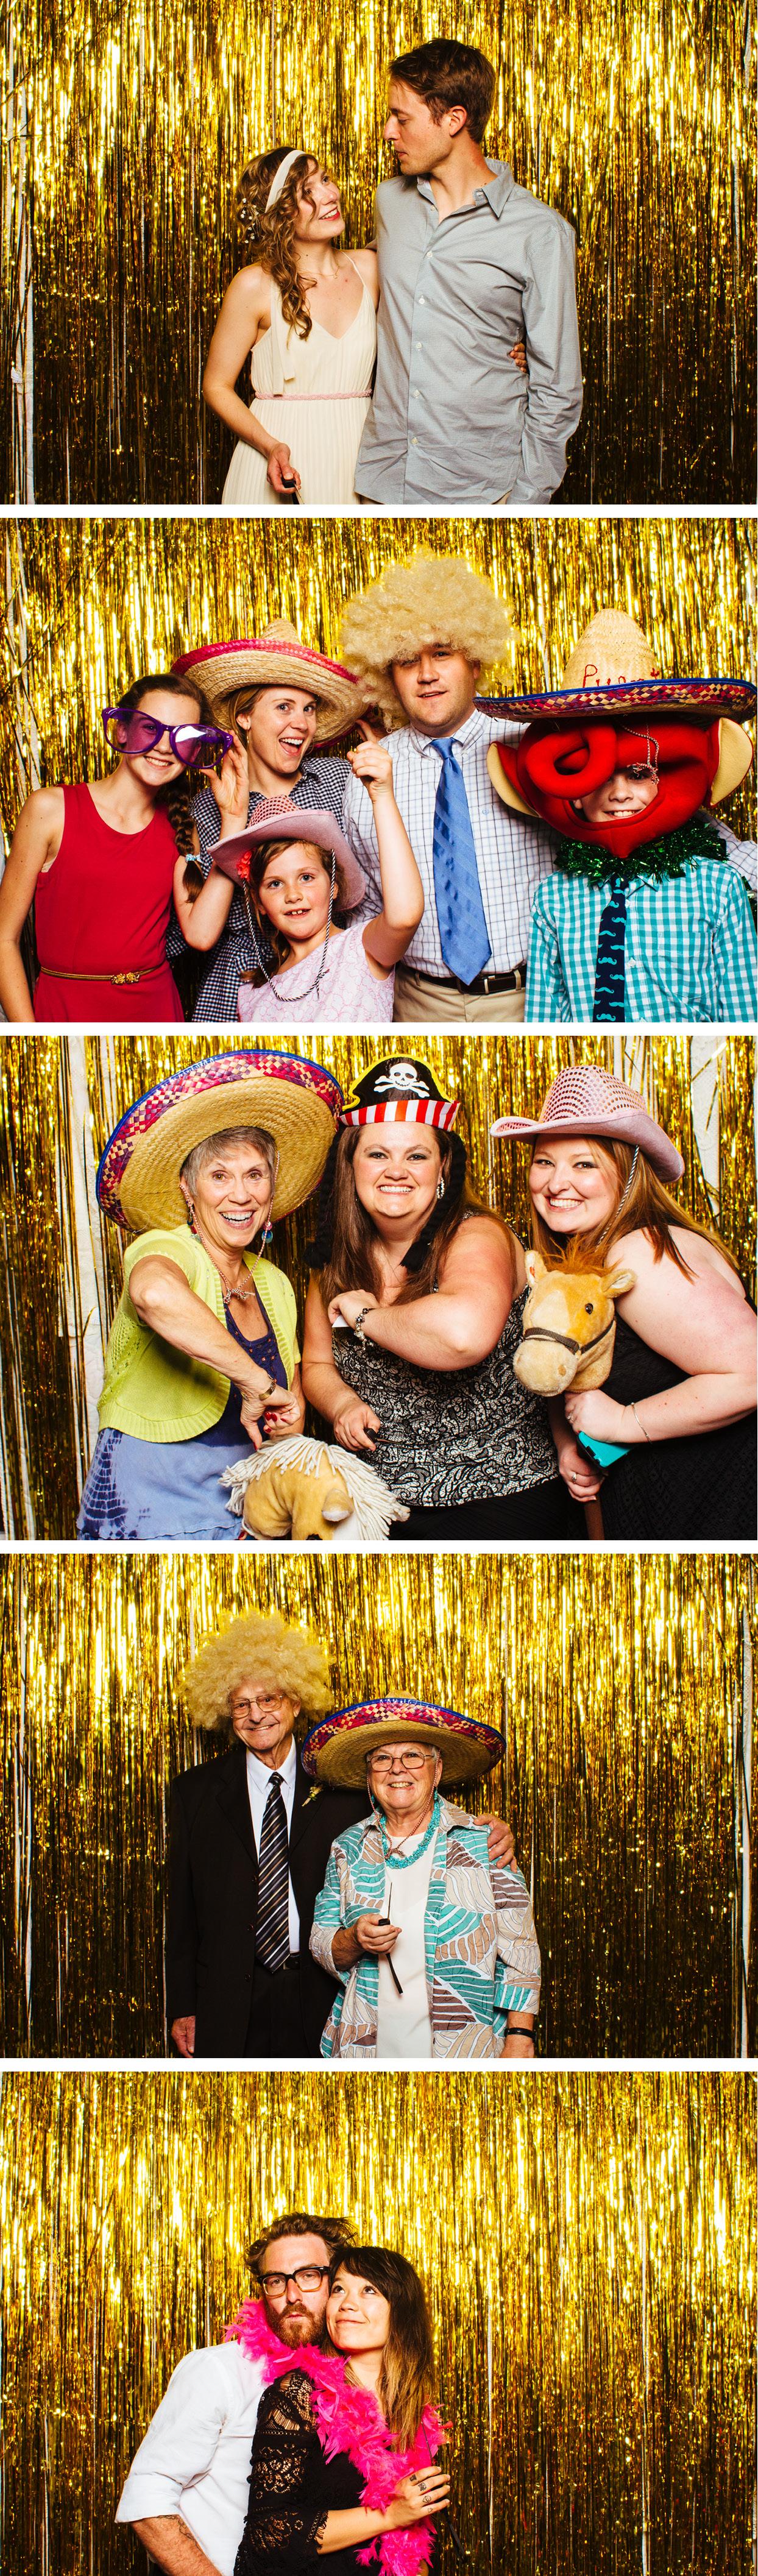 CK-Photo-Nashville-Wedding-Photographer-Photobooth-DL6.jpg